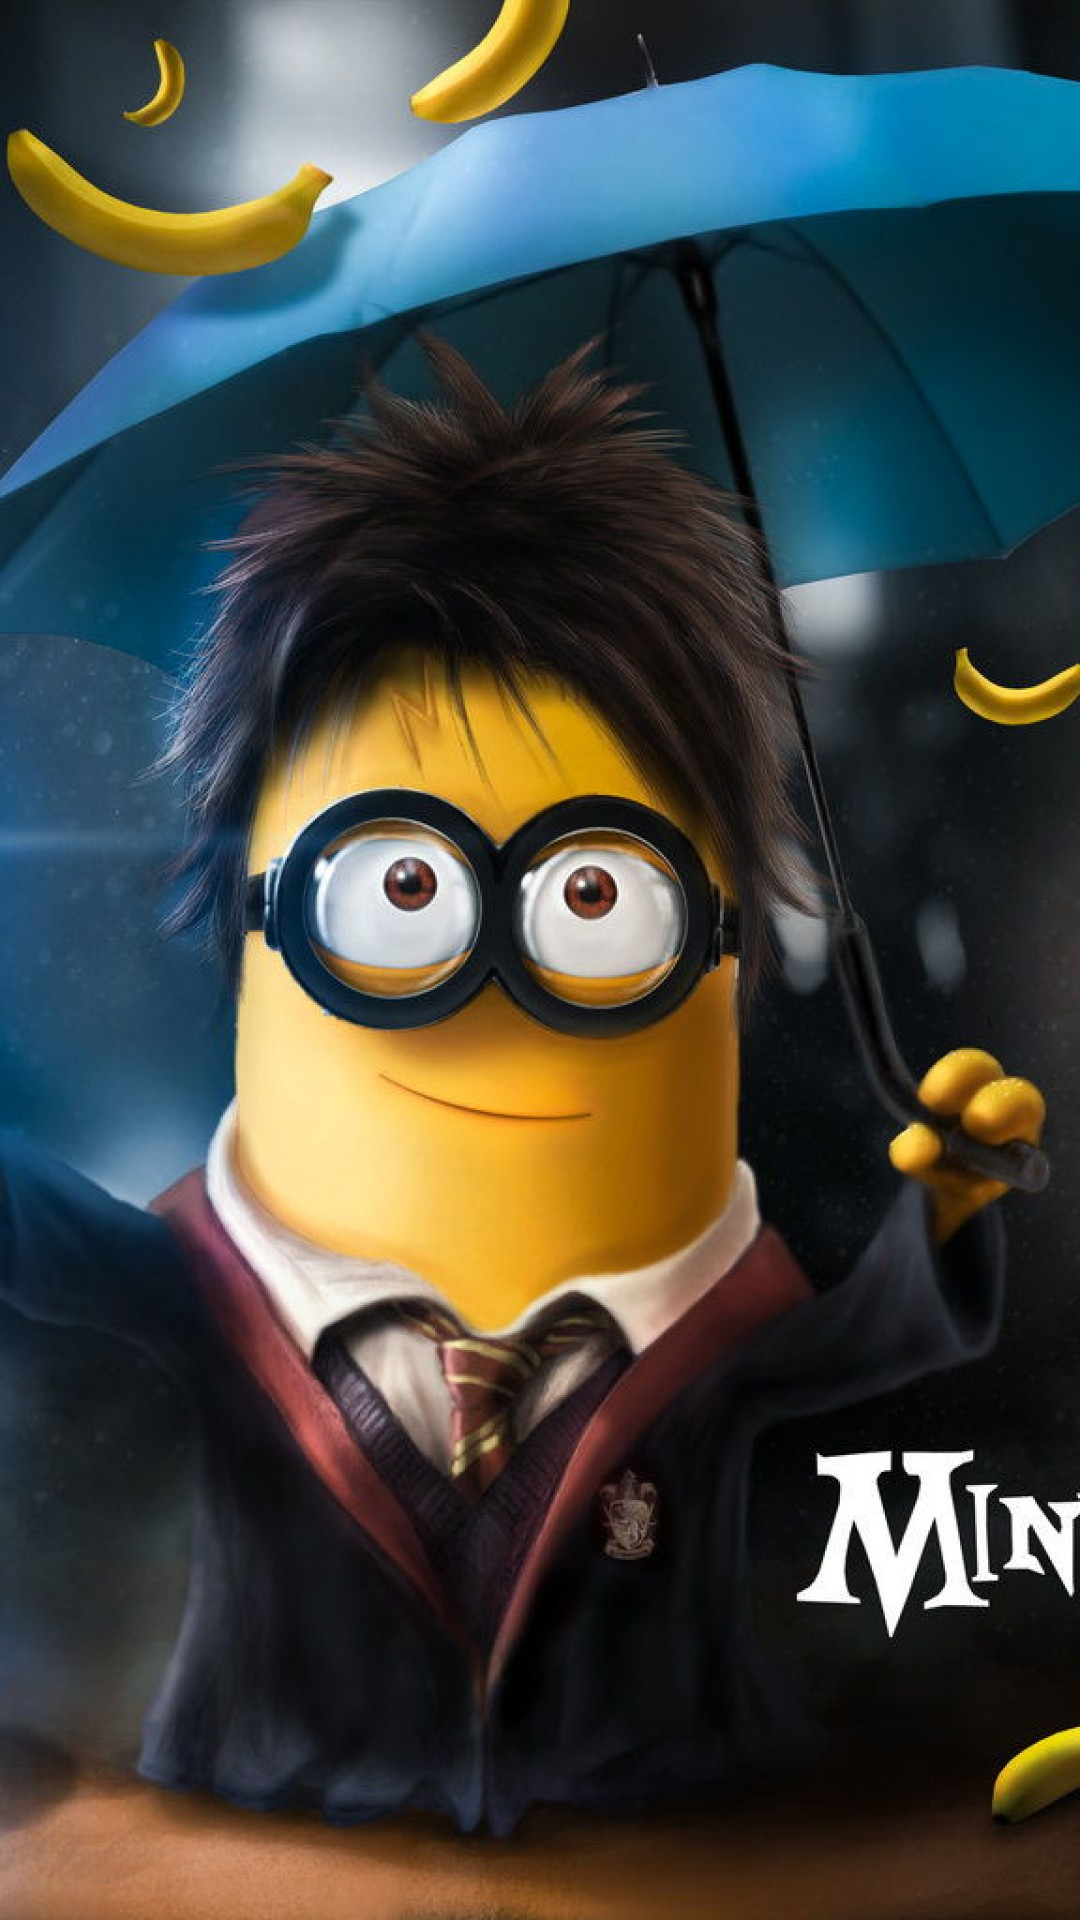 Harry Potter Iphone Wallpaper - Harry Potter Backgrounds For Iphone , HD Wallpaper & Backgrounds